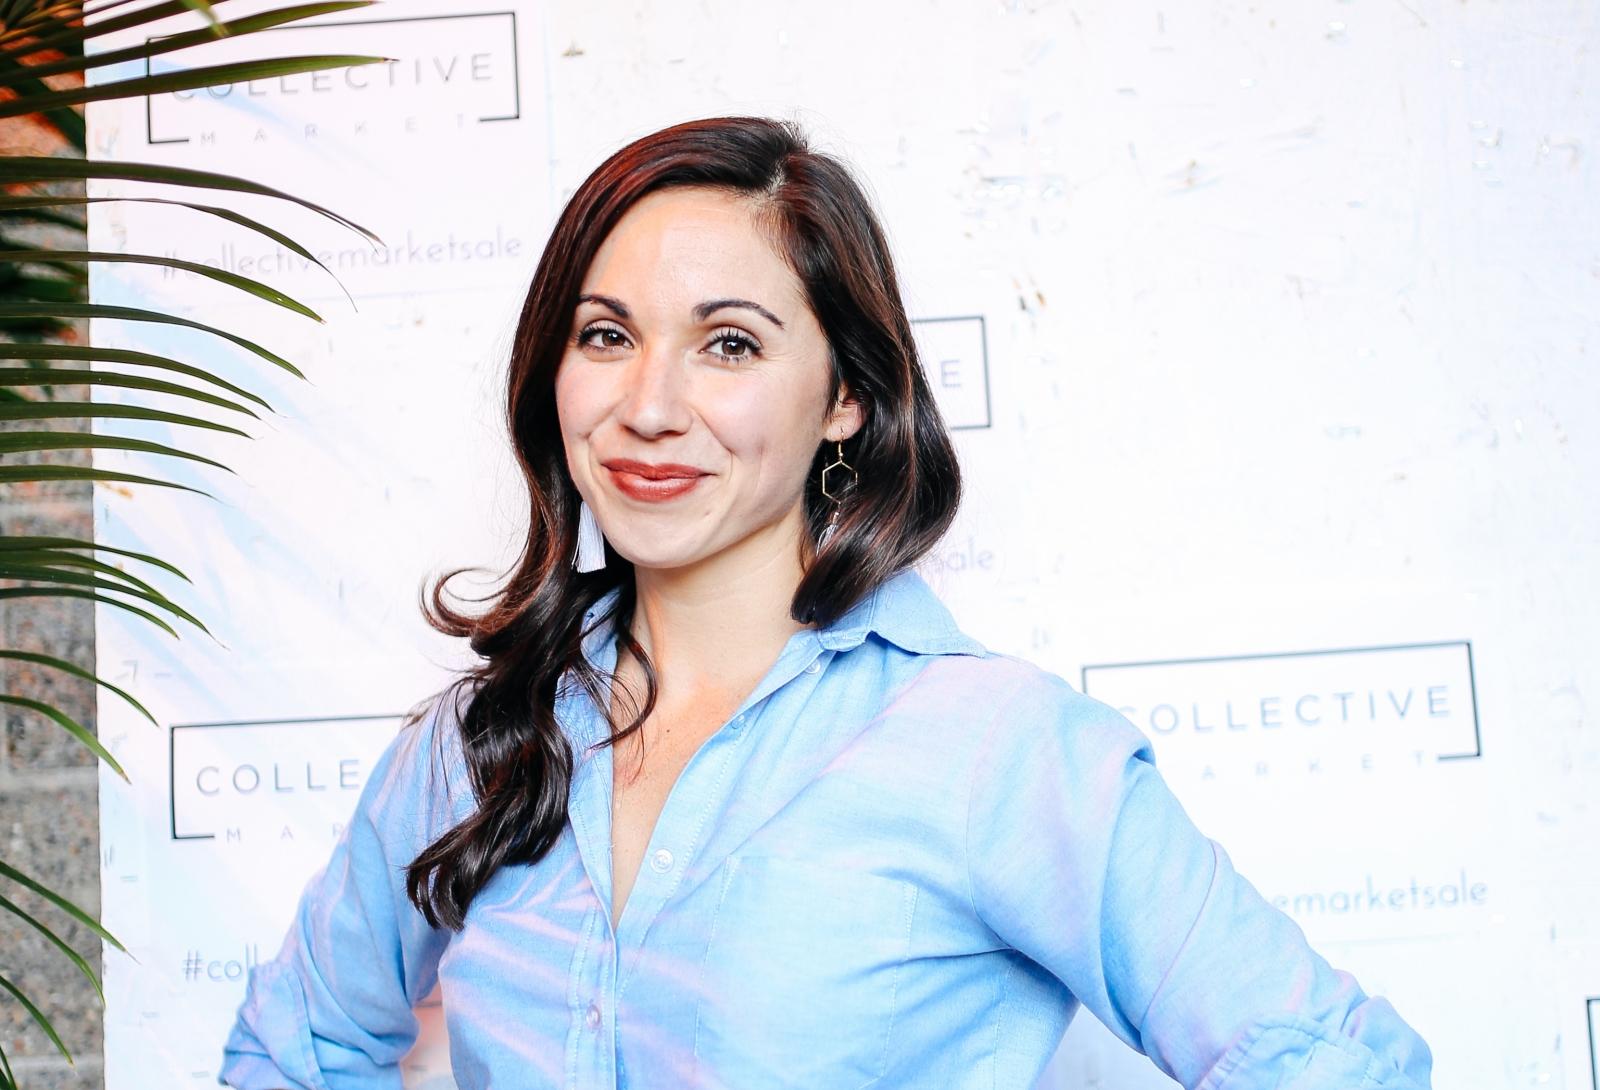 Serena Fallahi Tittl, founder of the Collective Market. Photo courtesy Collective Market.